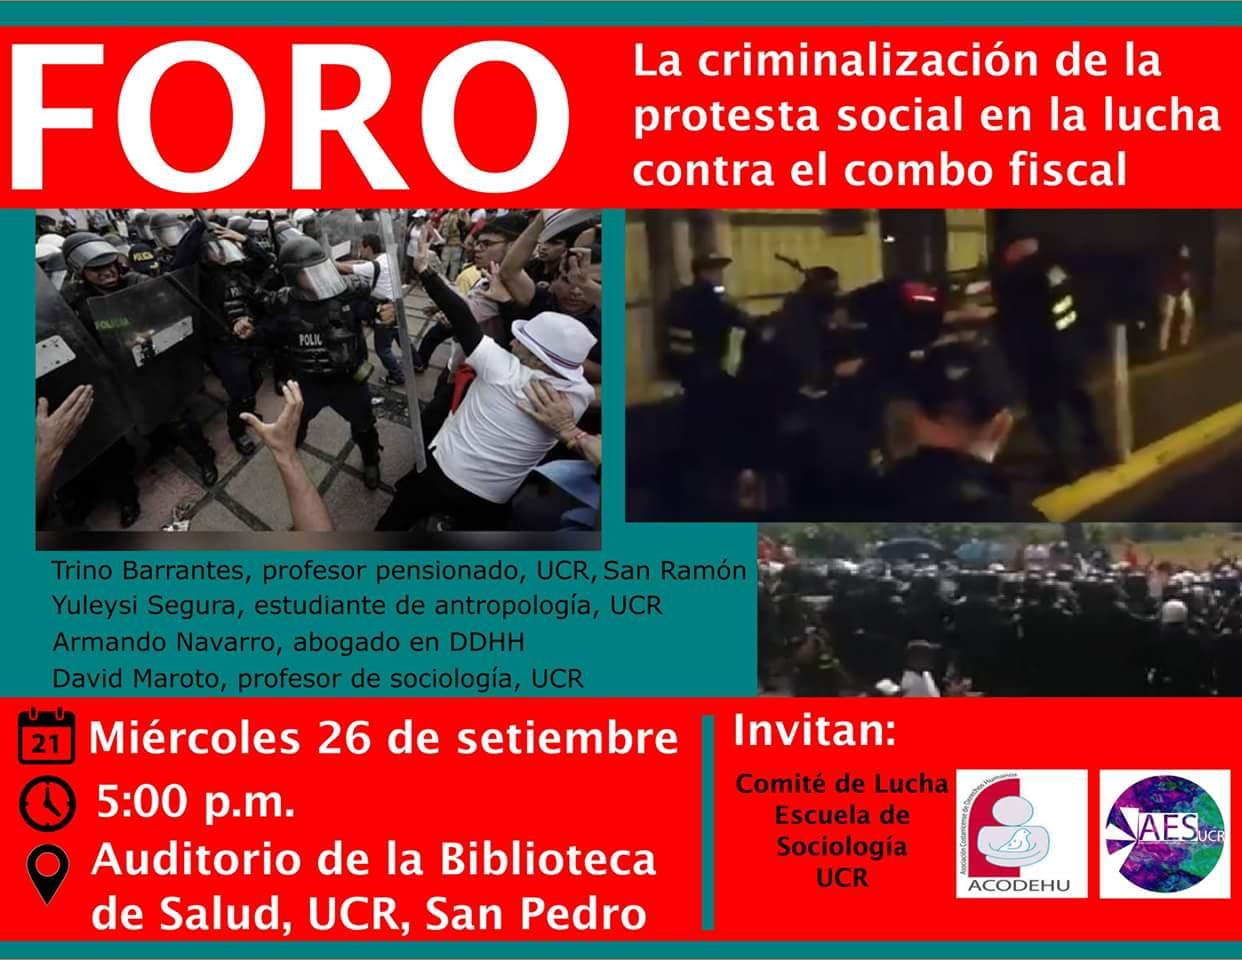 Foro Criminalizacion de la protesta social en la lucha contra el combo fiscal